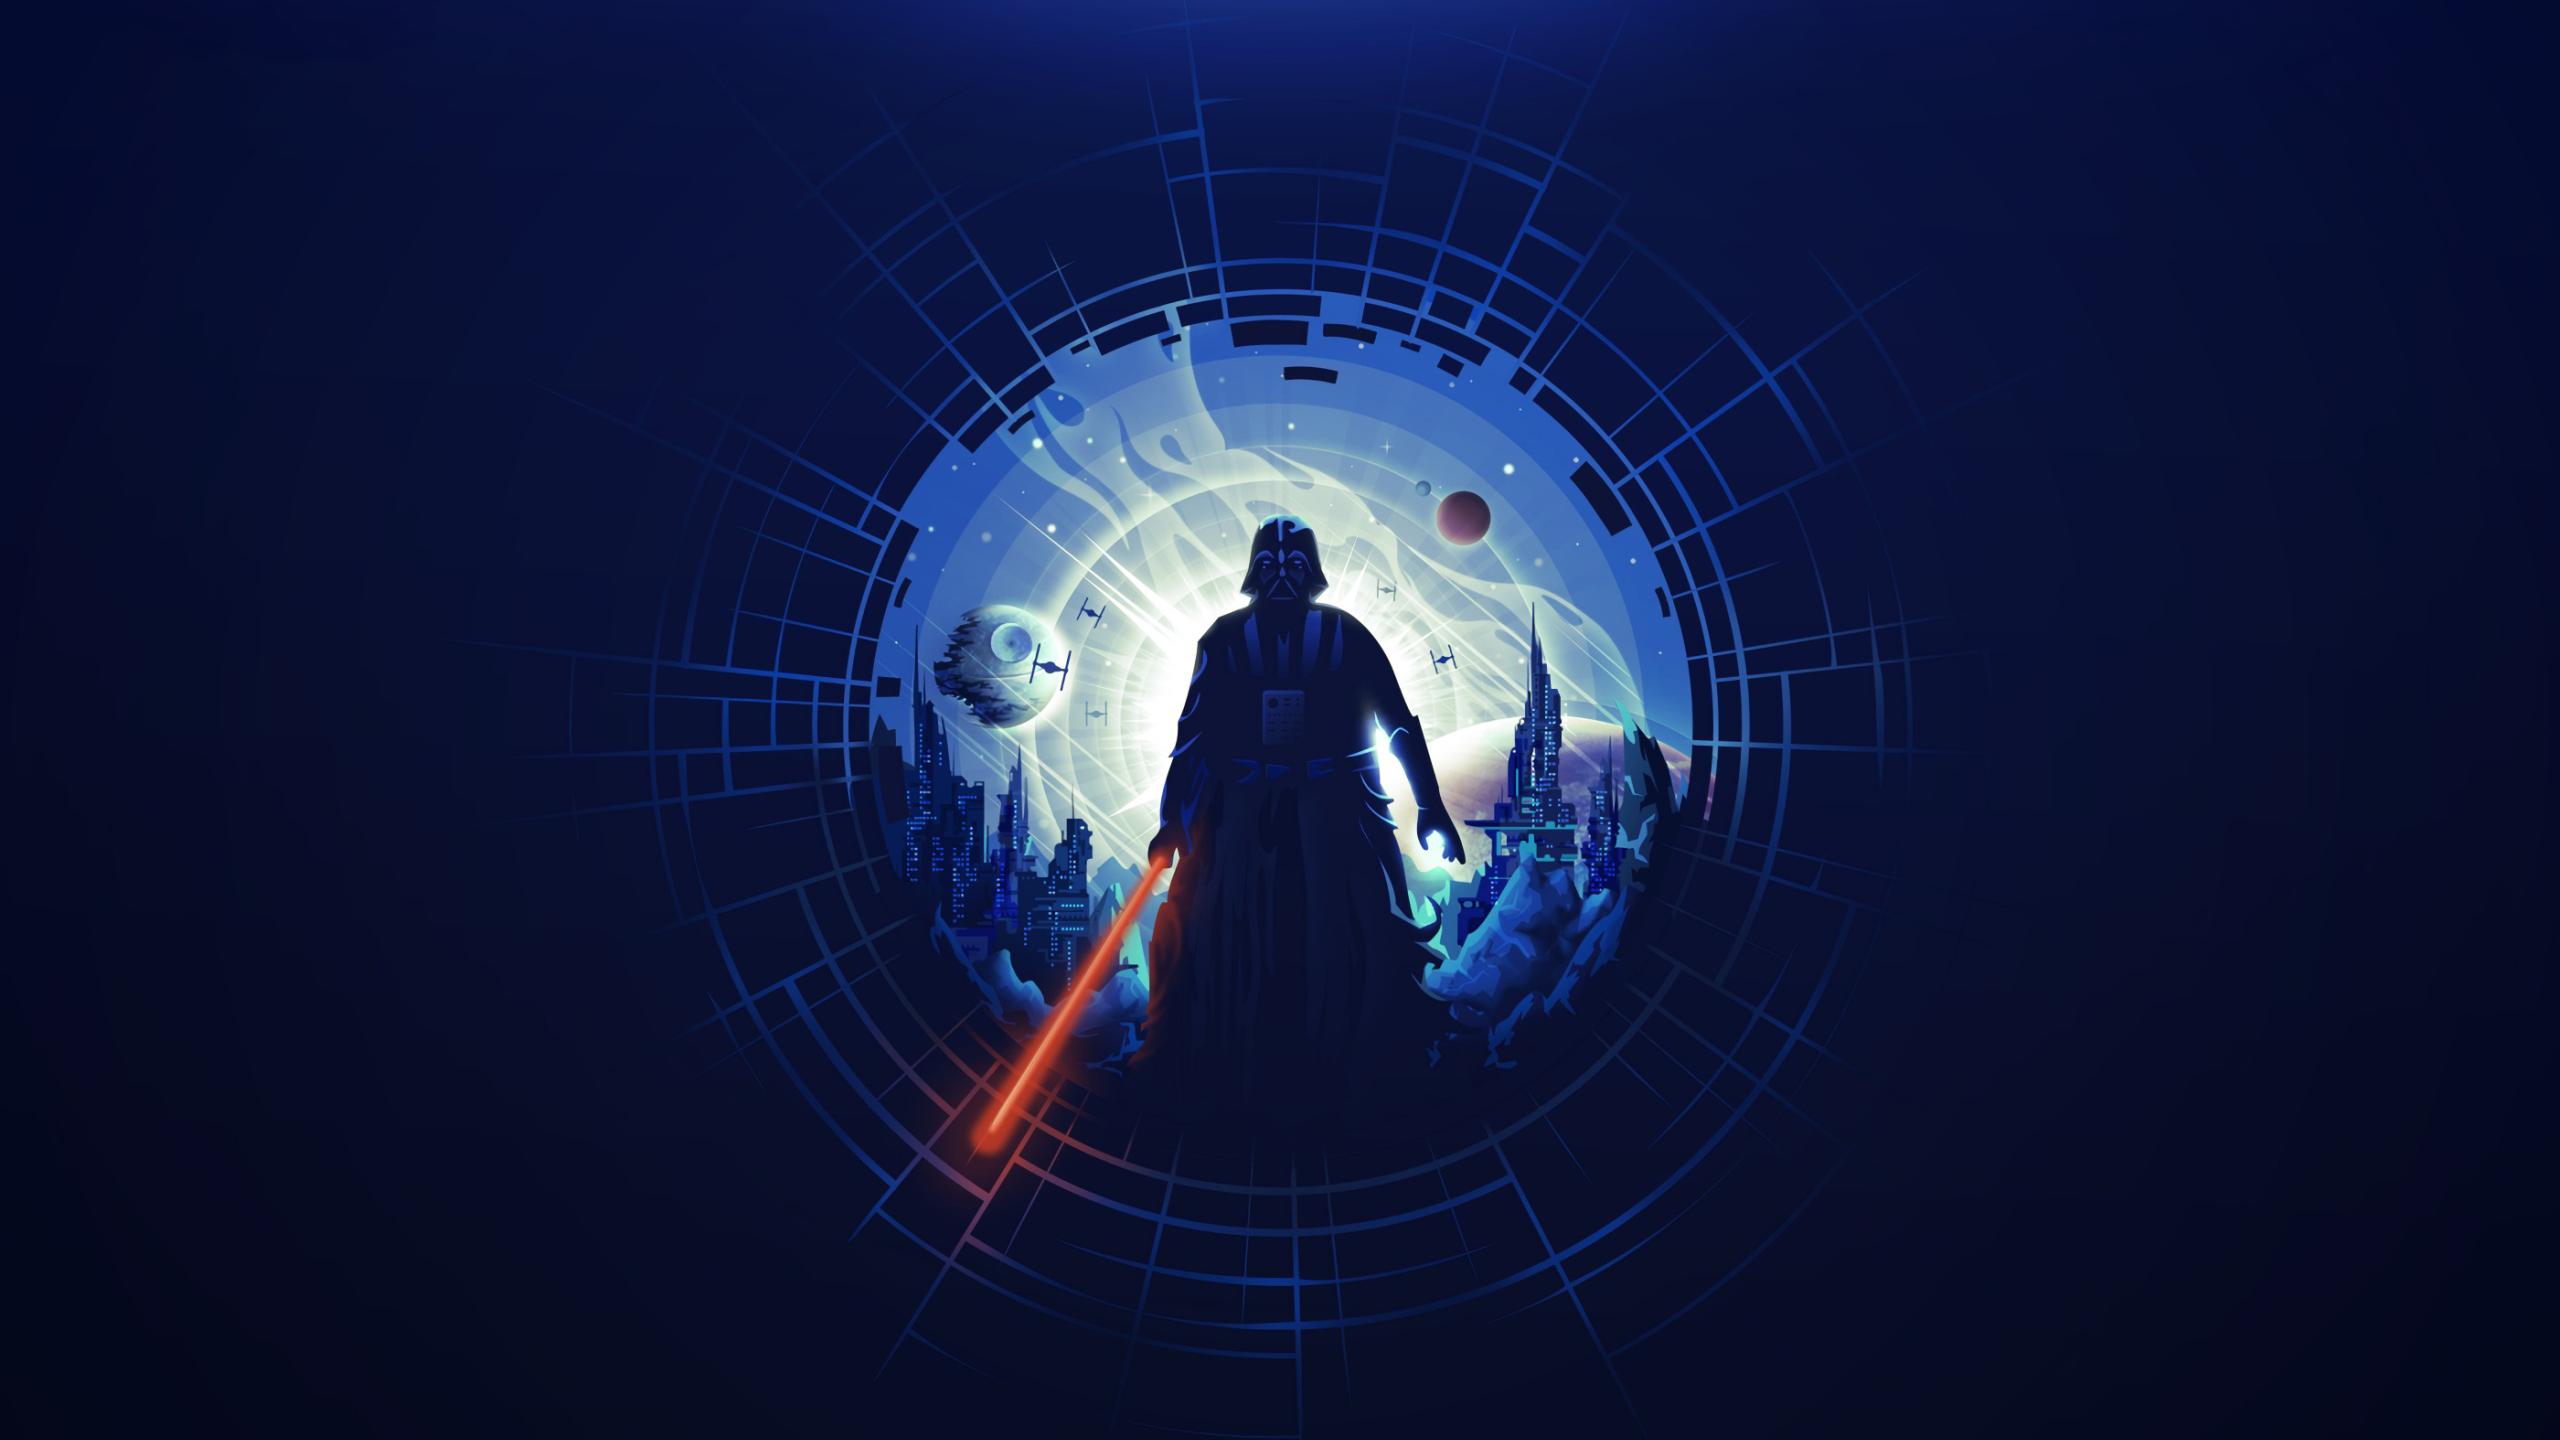 2560x1440 Darth Vader Minimalist 1440p Resolution Wallpaper